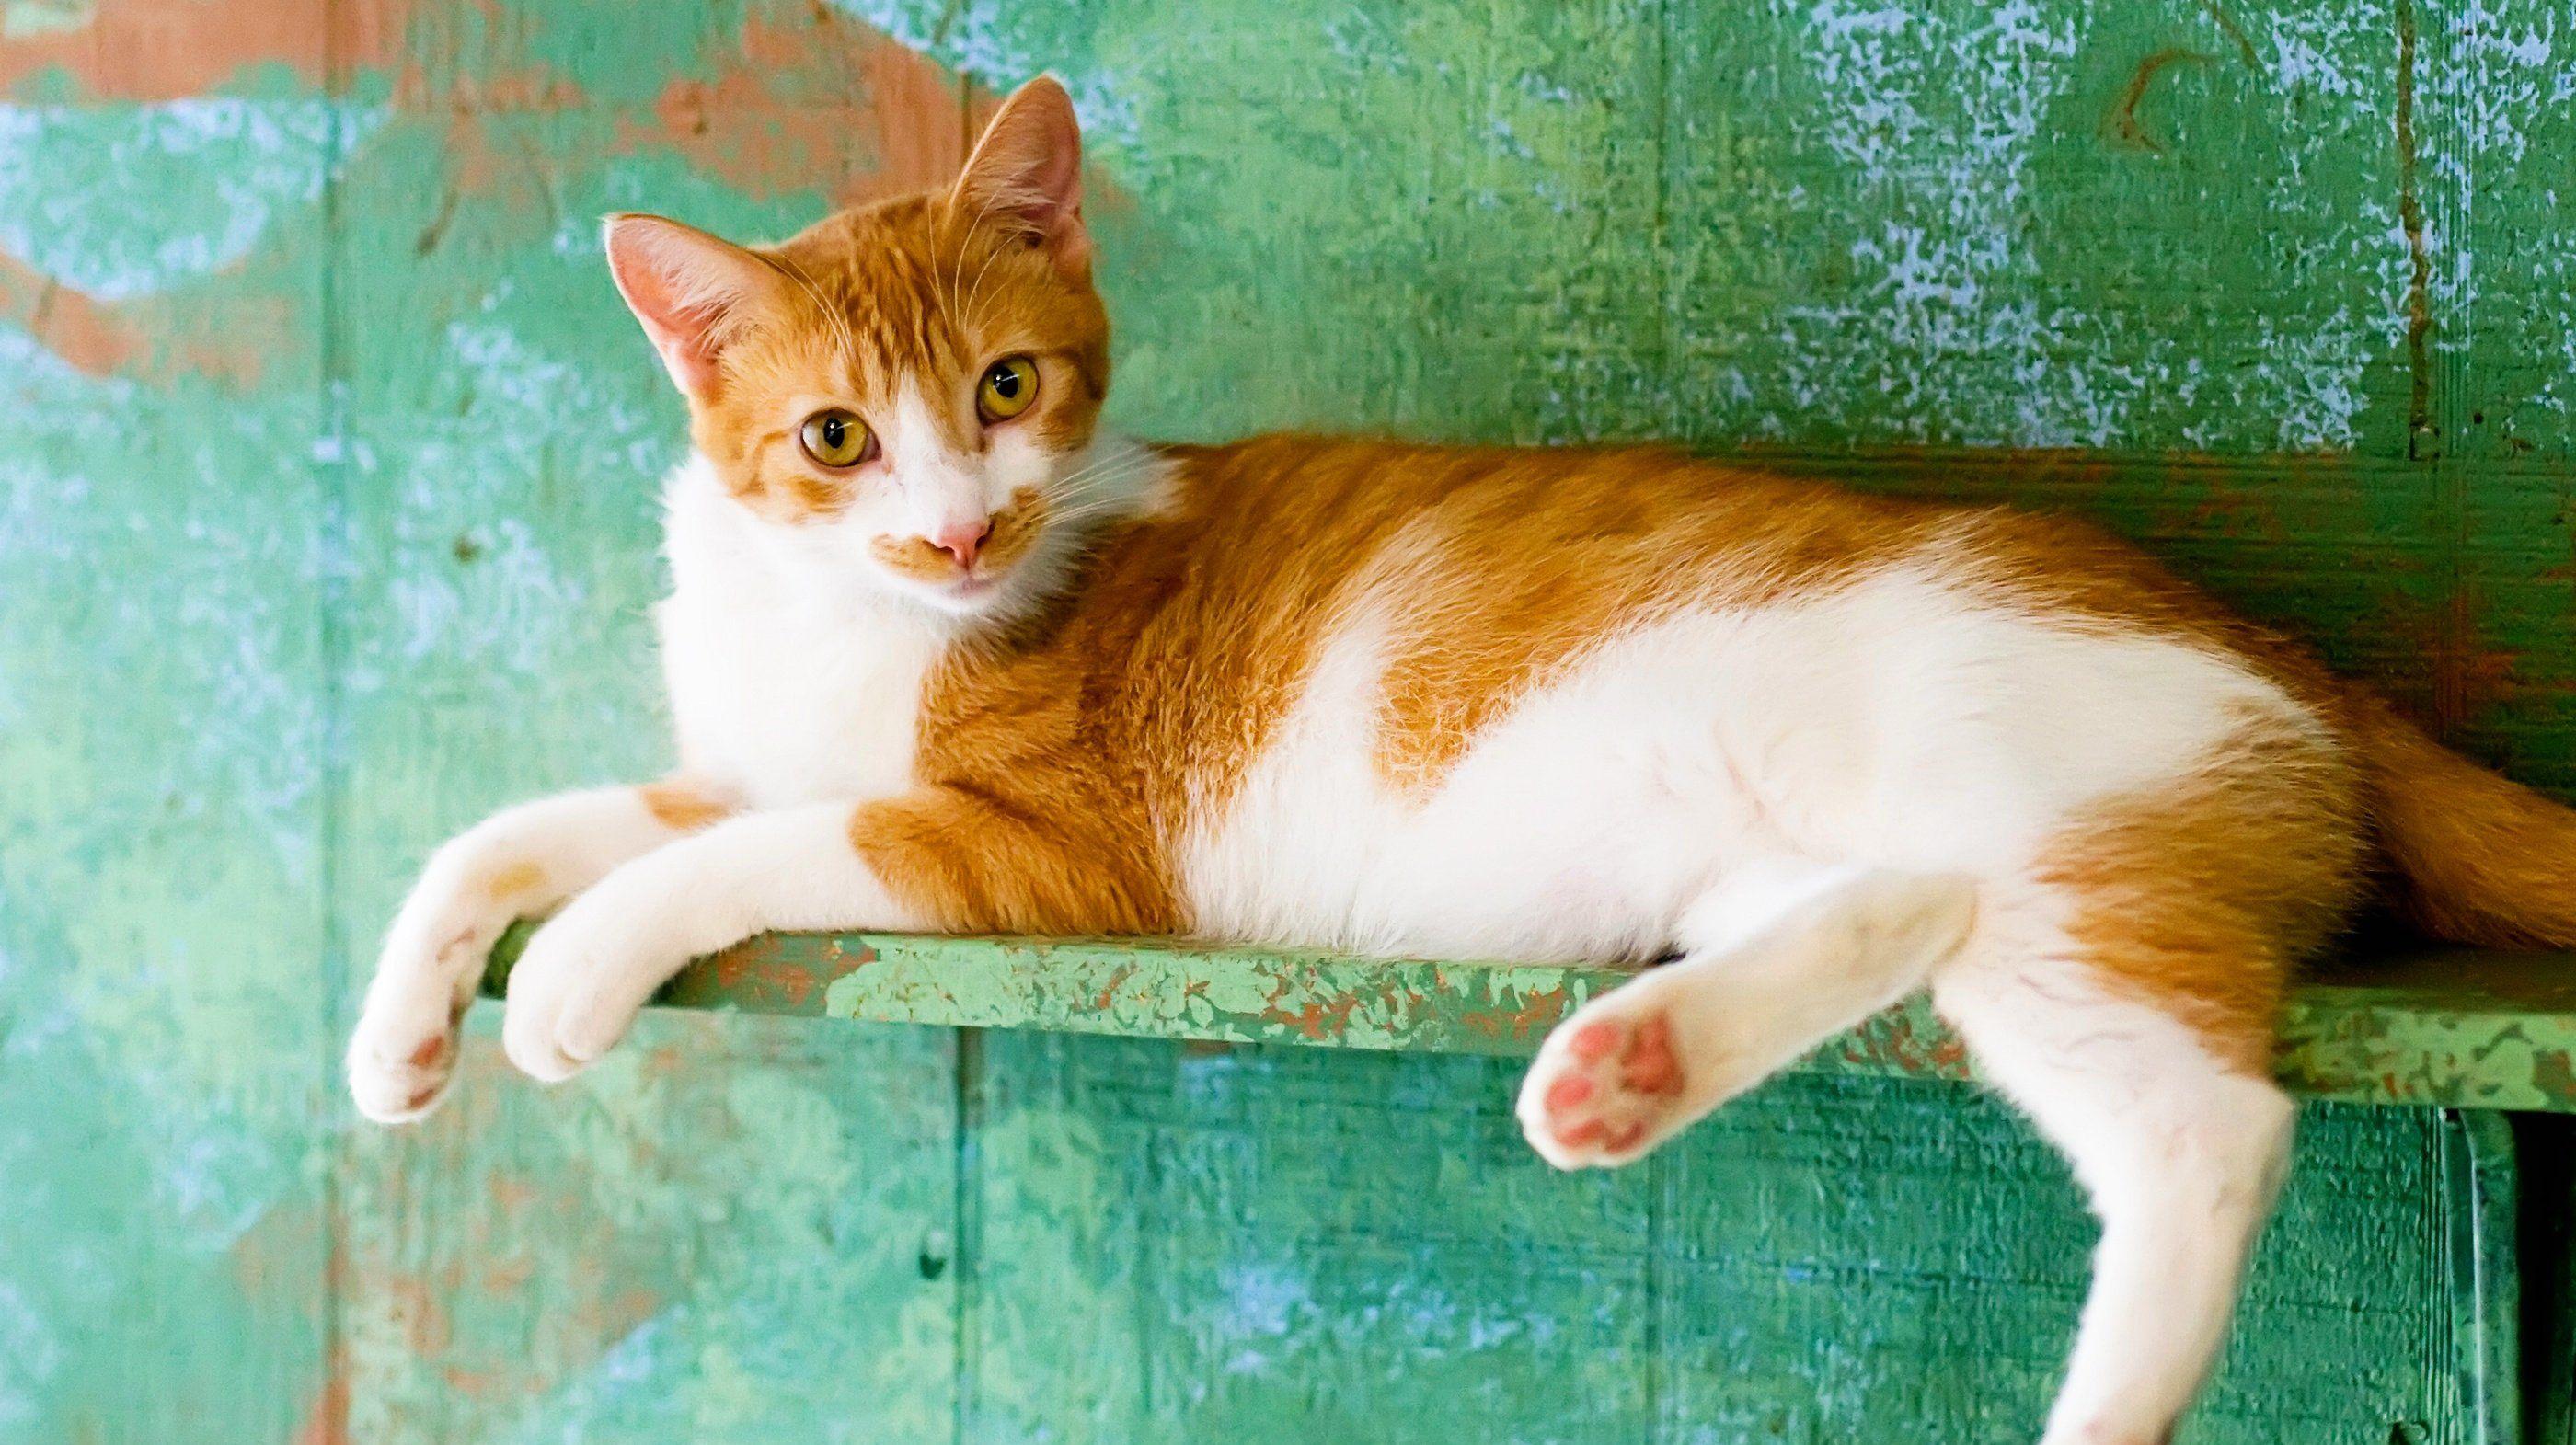 Orange and white cat on a shelf.